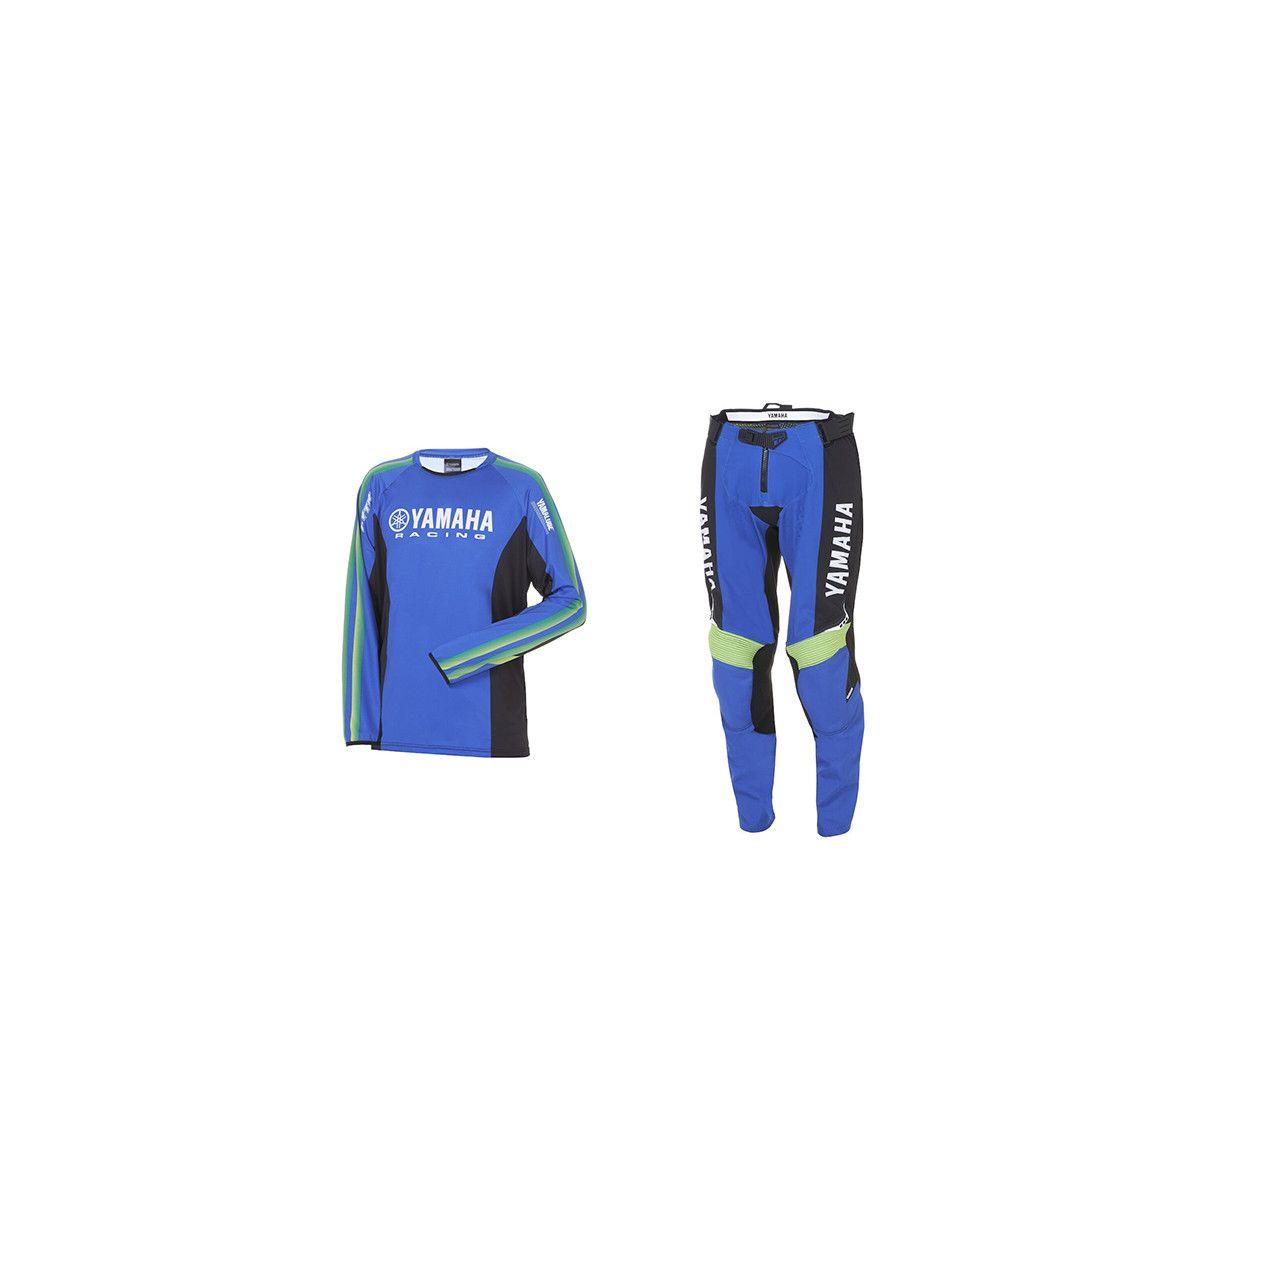 YAMAHA Pack MX adulte pantalon + maillot